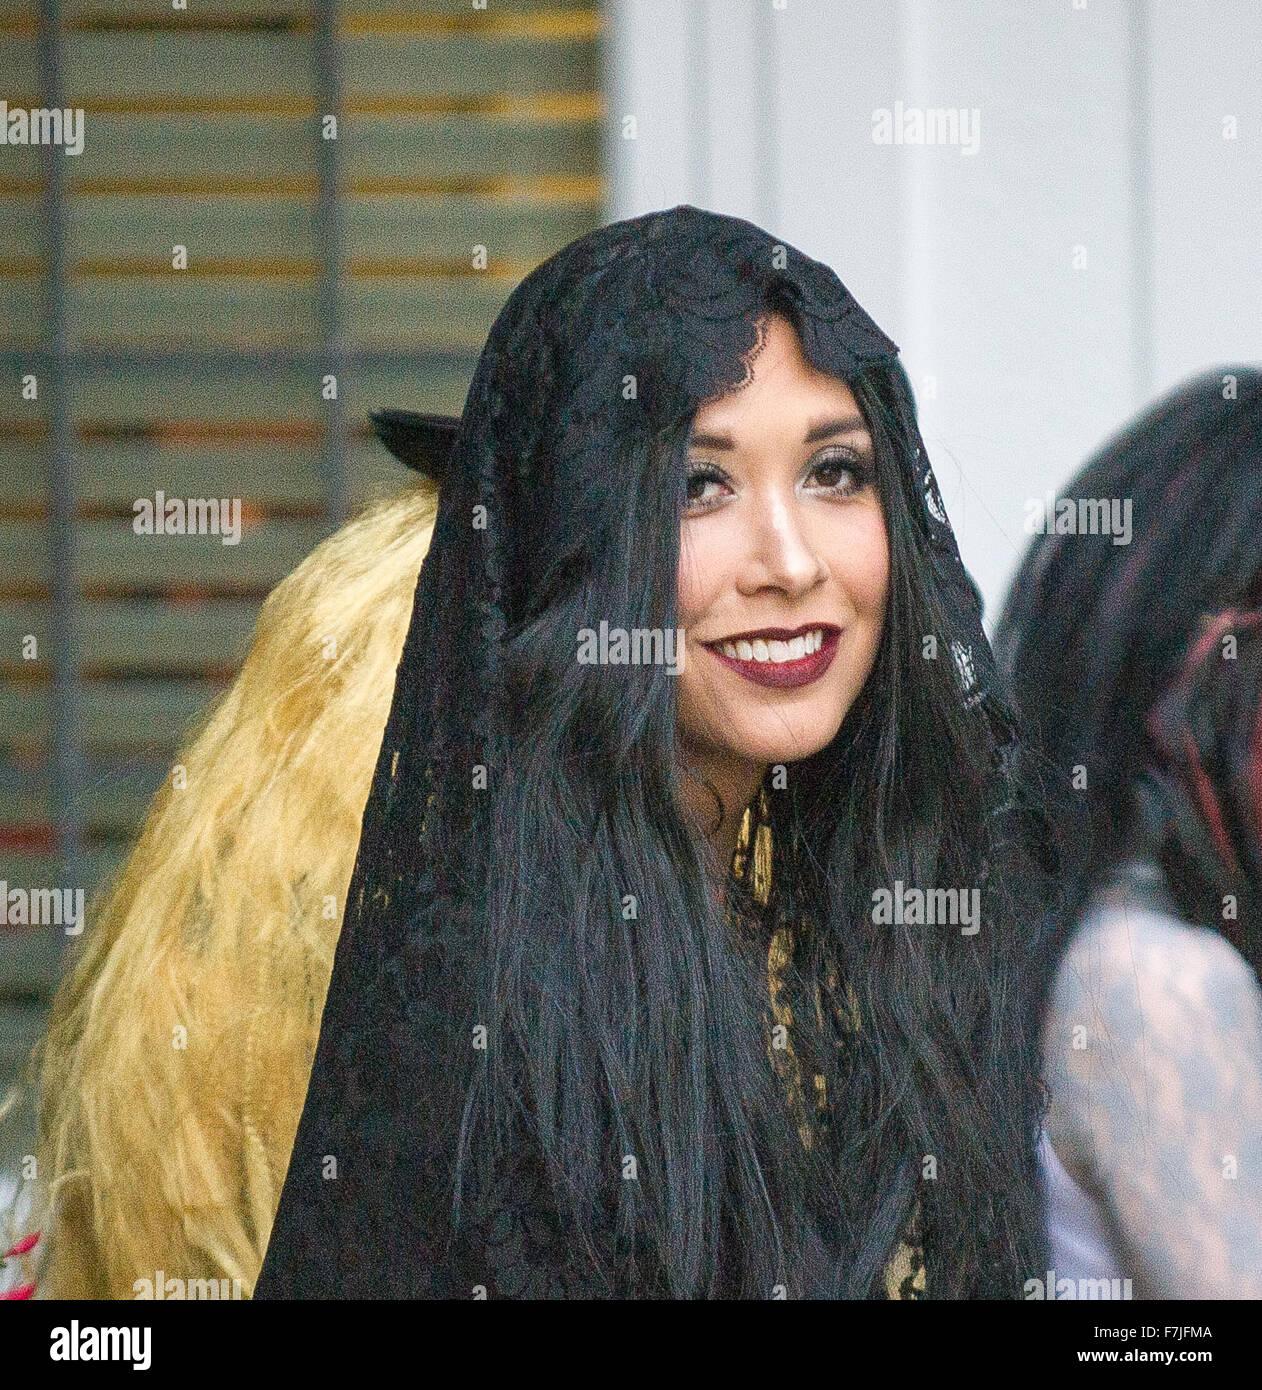 Camille Kostek Trolls: Ava Addams Nude Photos 2019